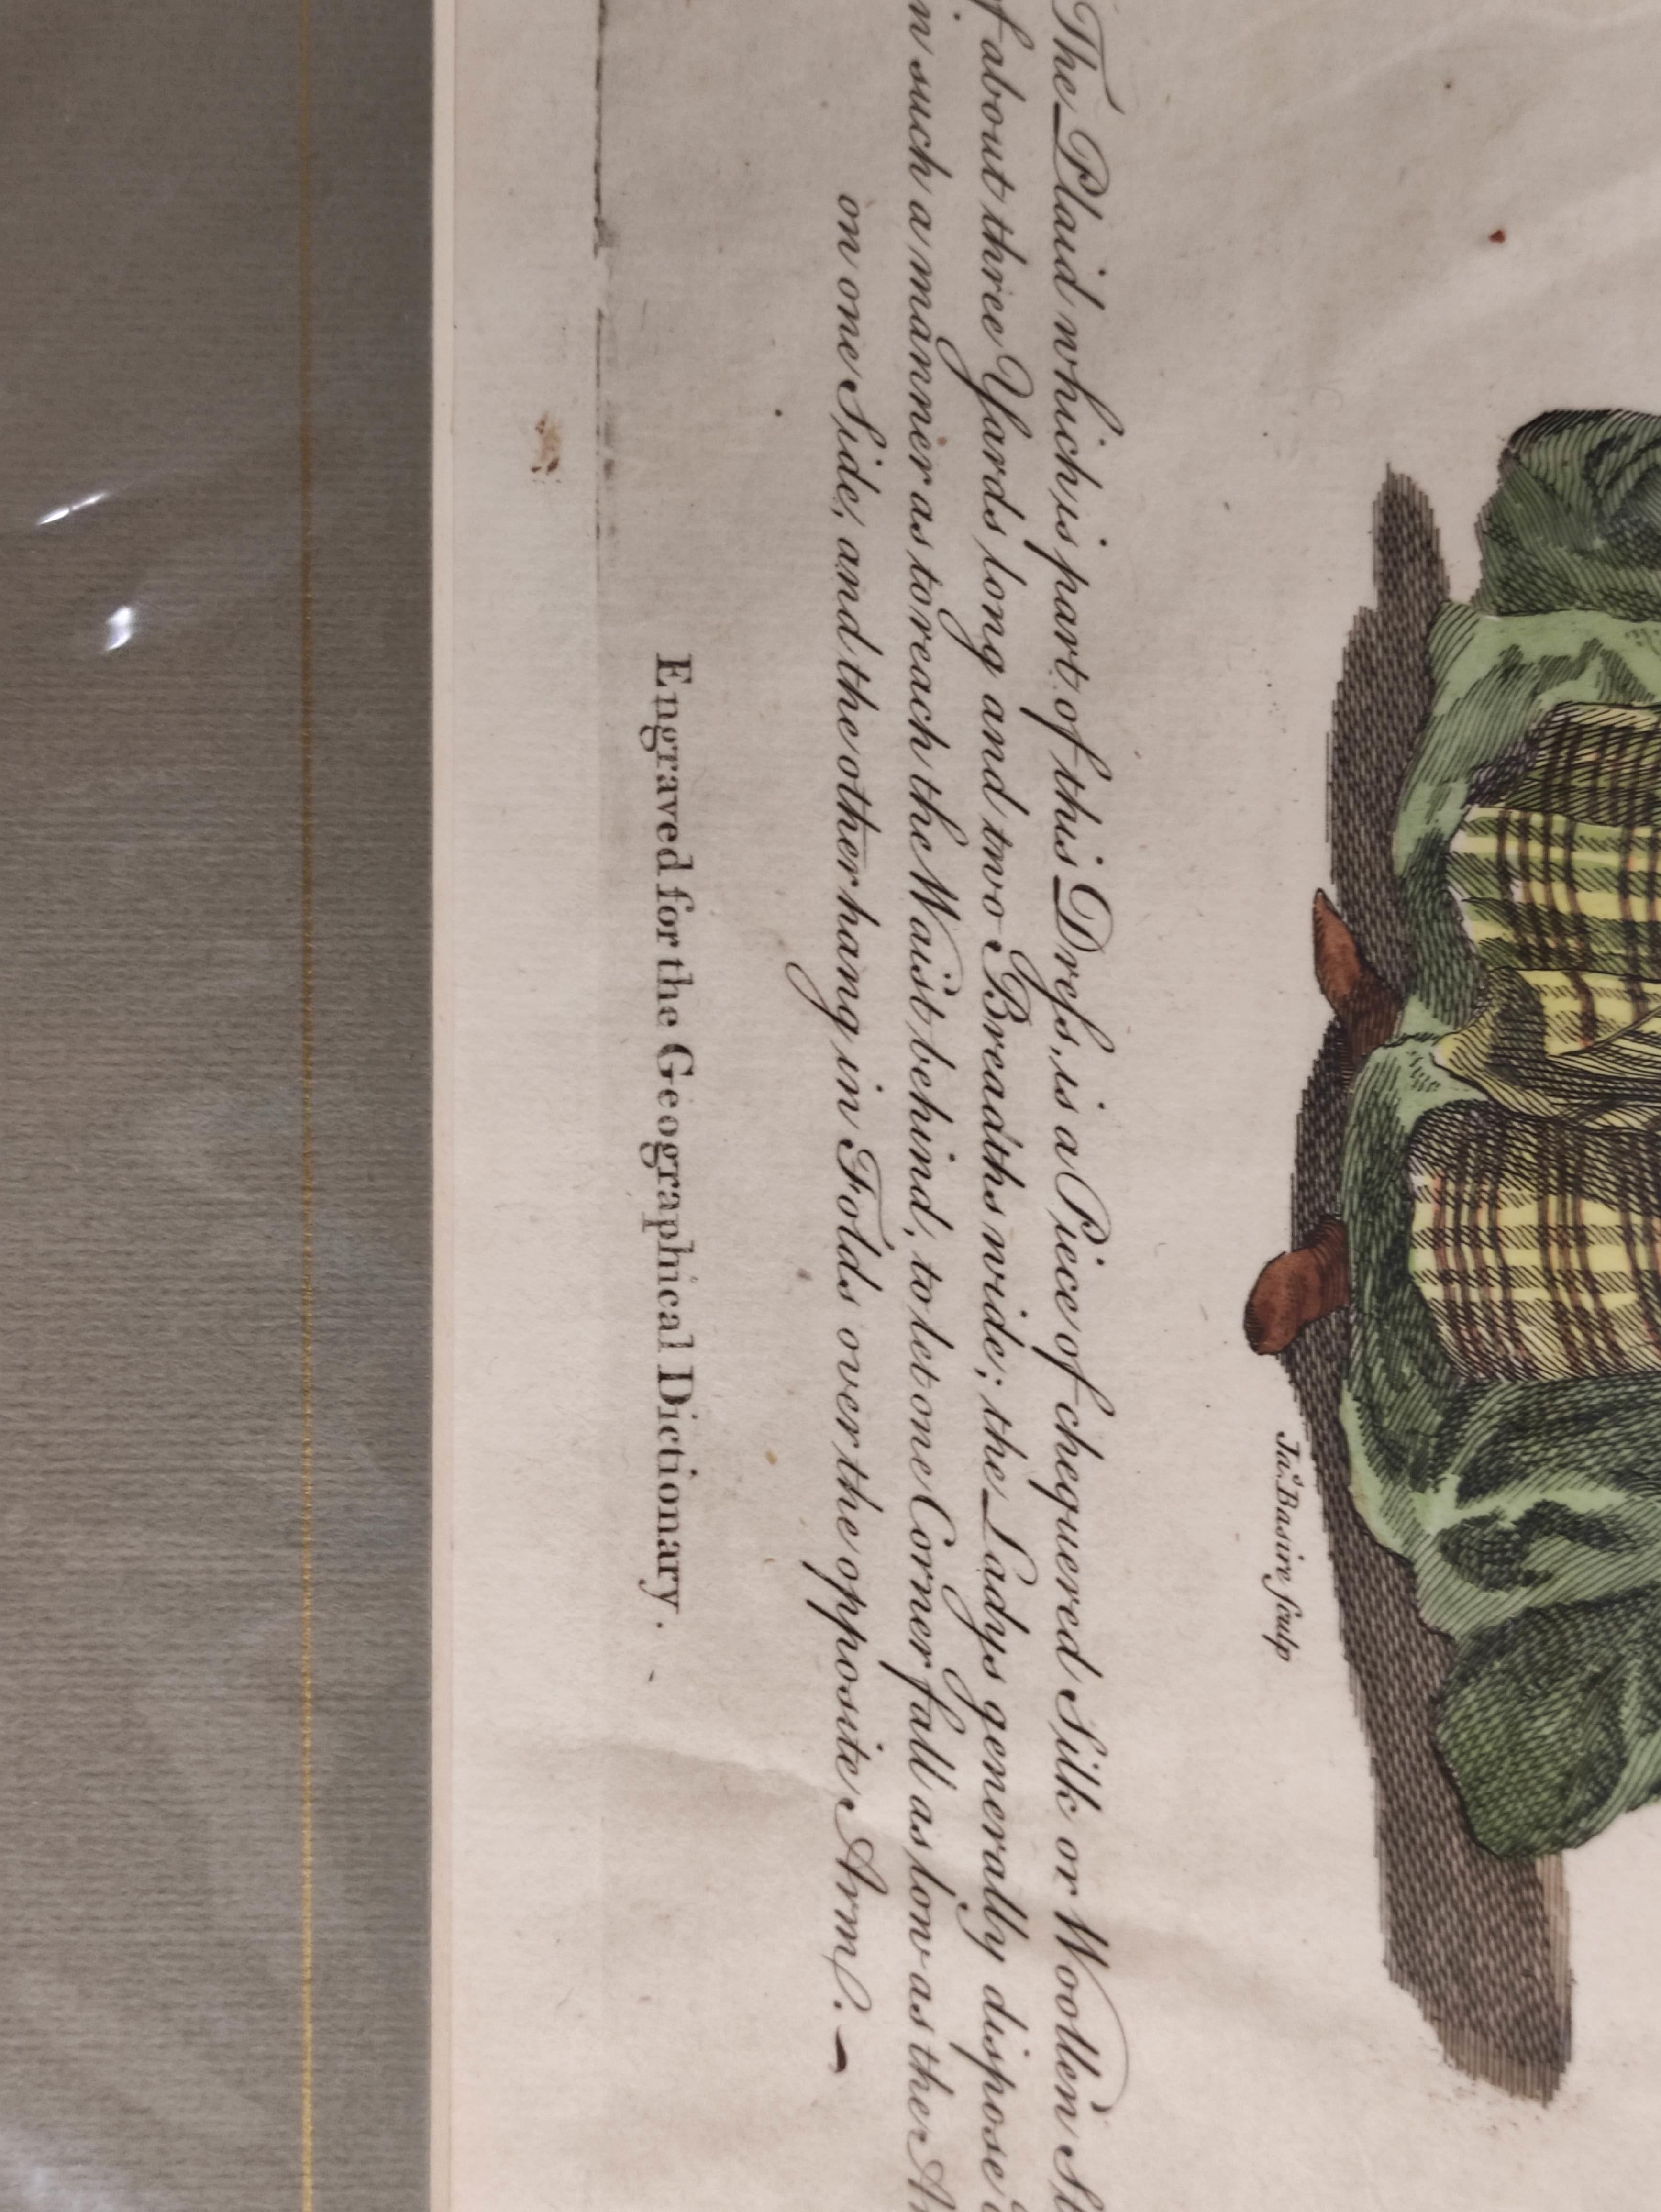 Highland Costume.4 hand coloured engraved plates, 2 framed. - Image 6 of 6